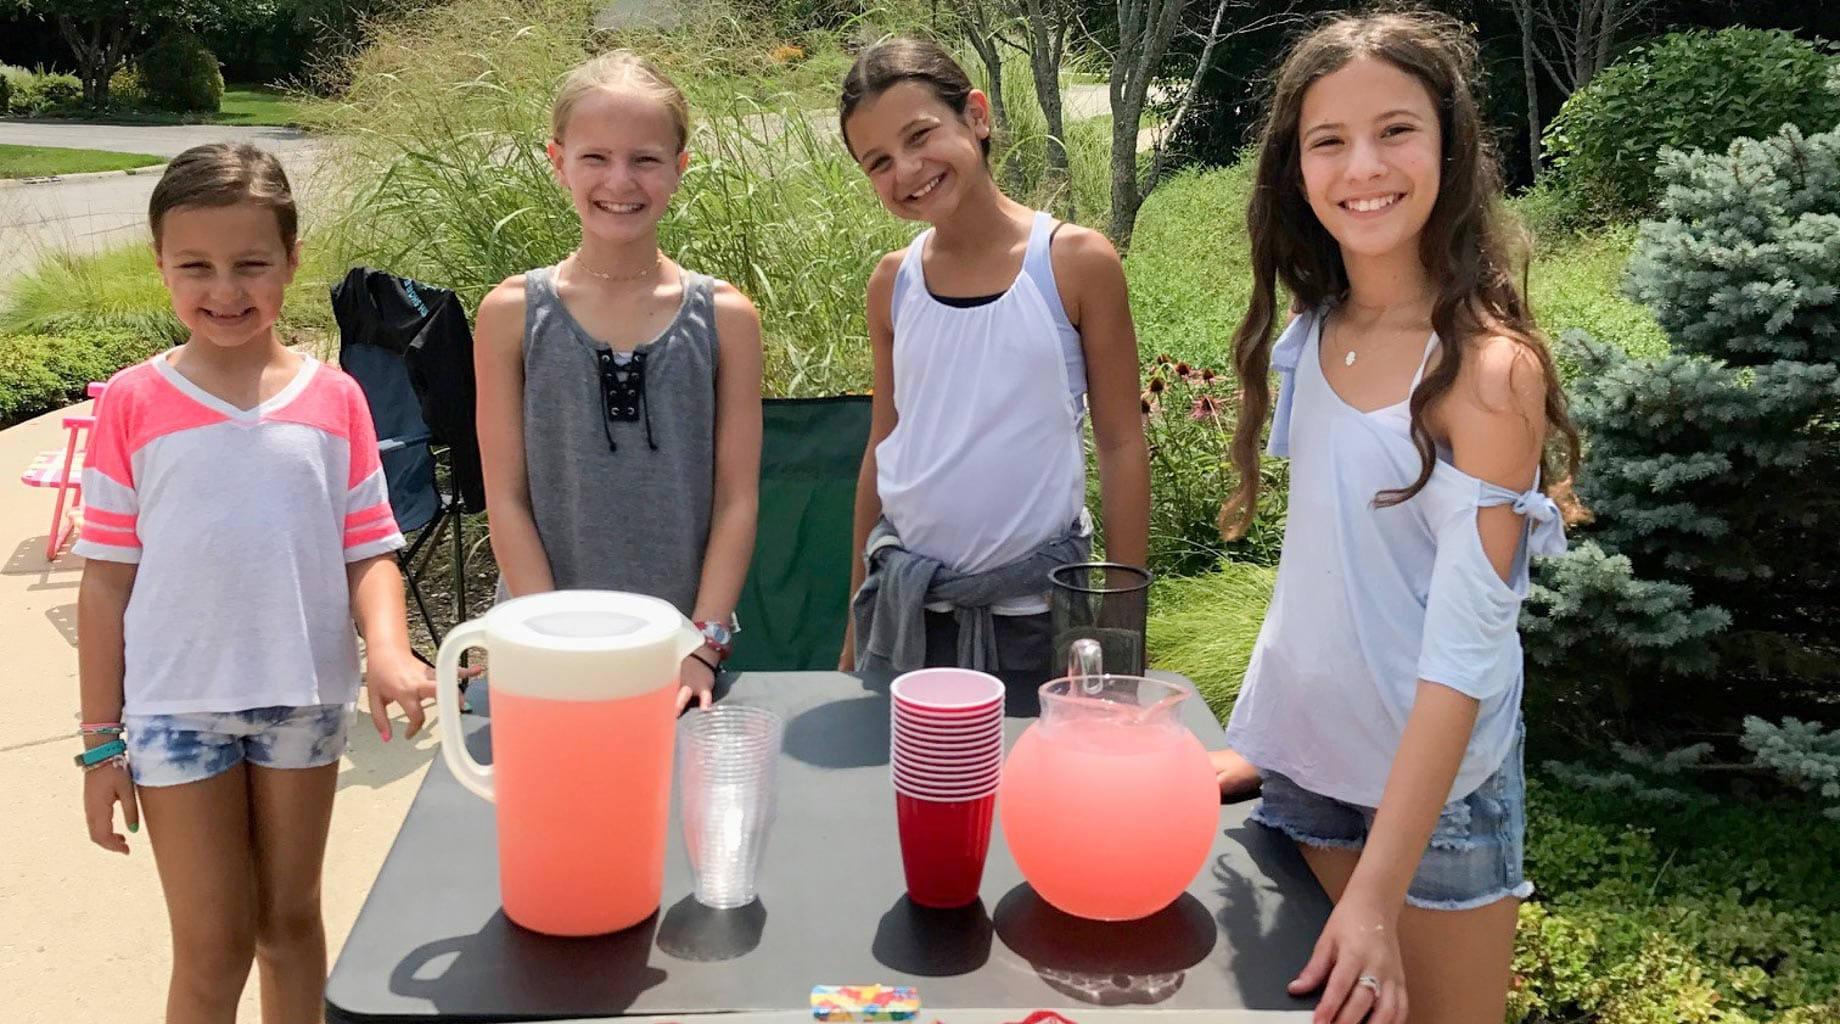 Girls at lemonade stand